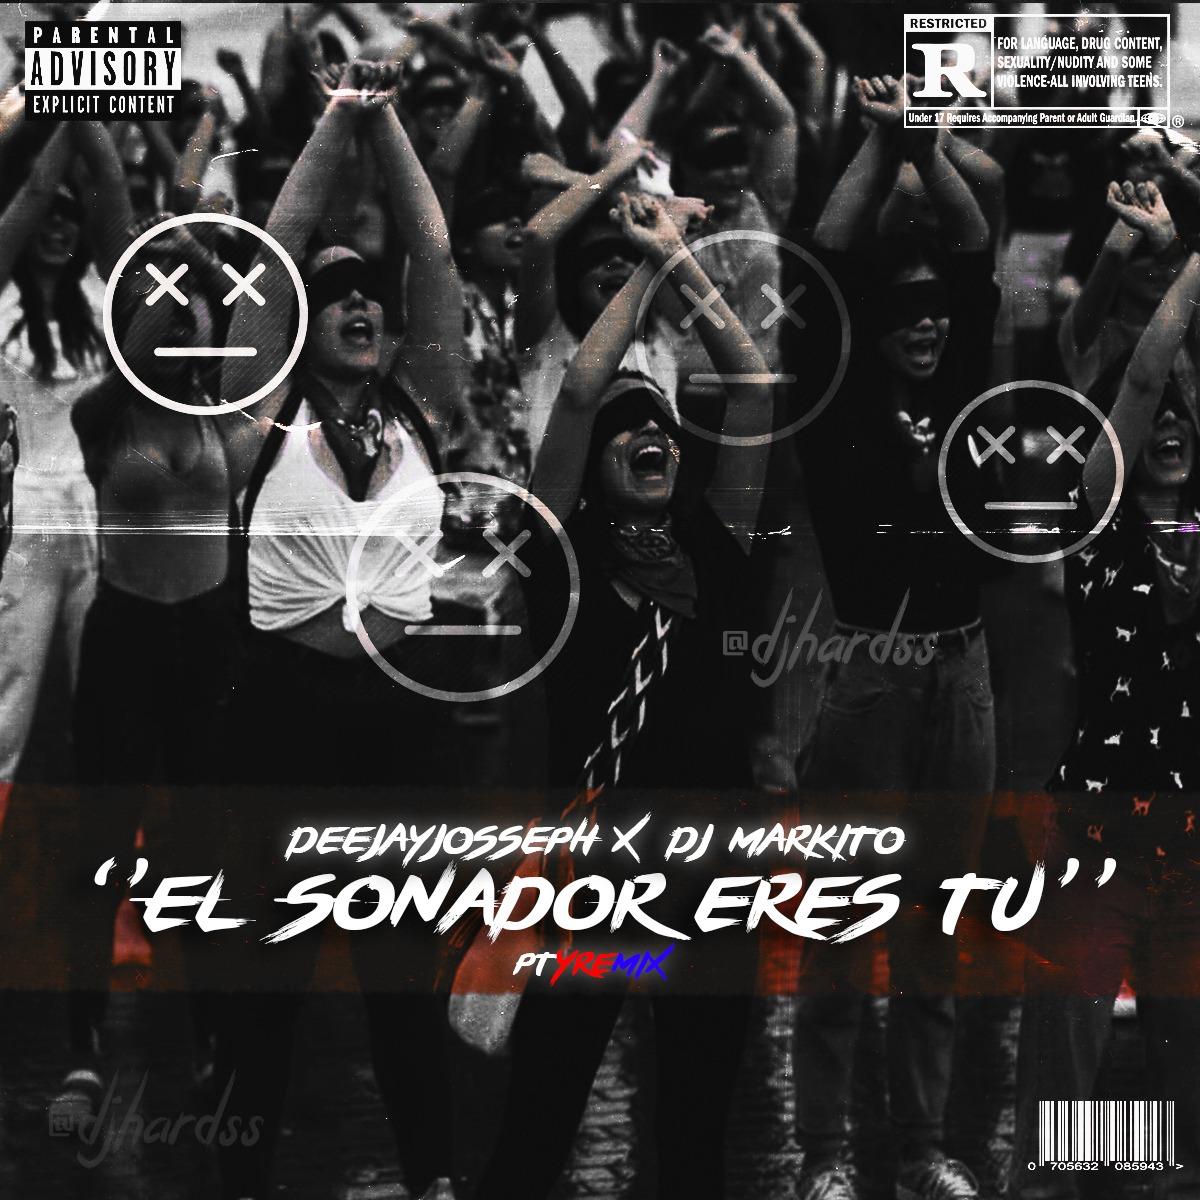 Deejay Josseph Ft. Dj Markito - El Sonador eres tu (MashUp Remix)